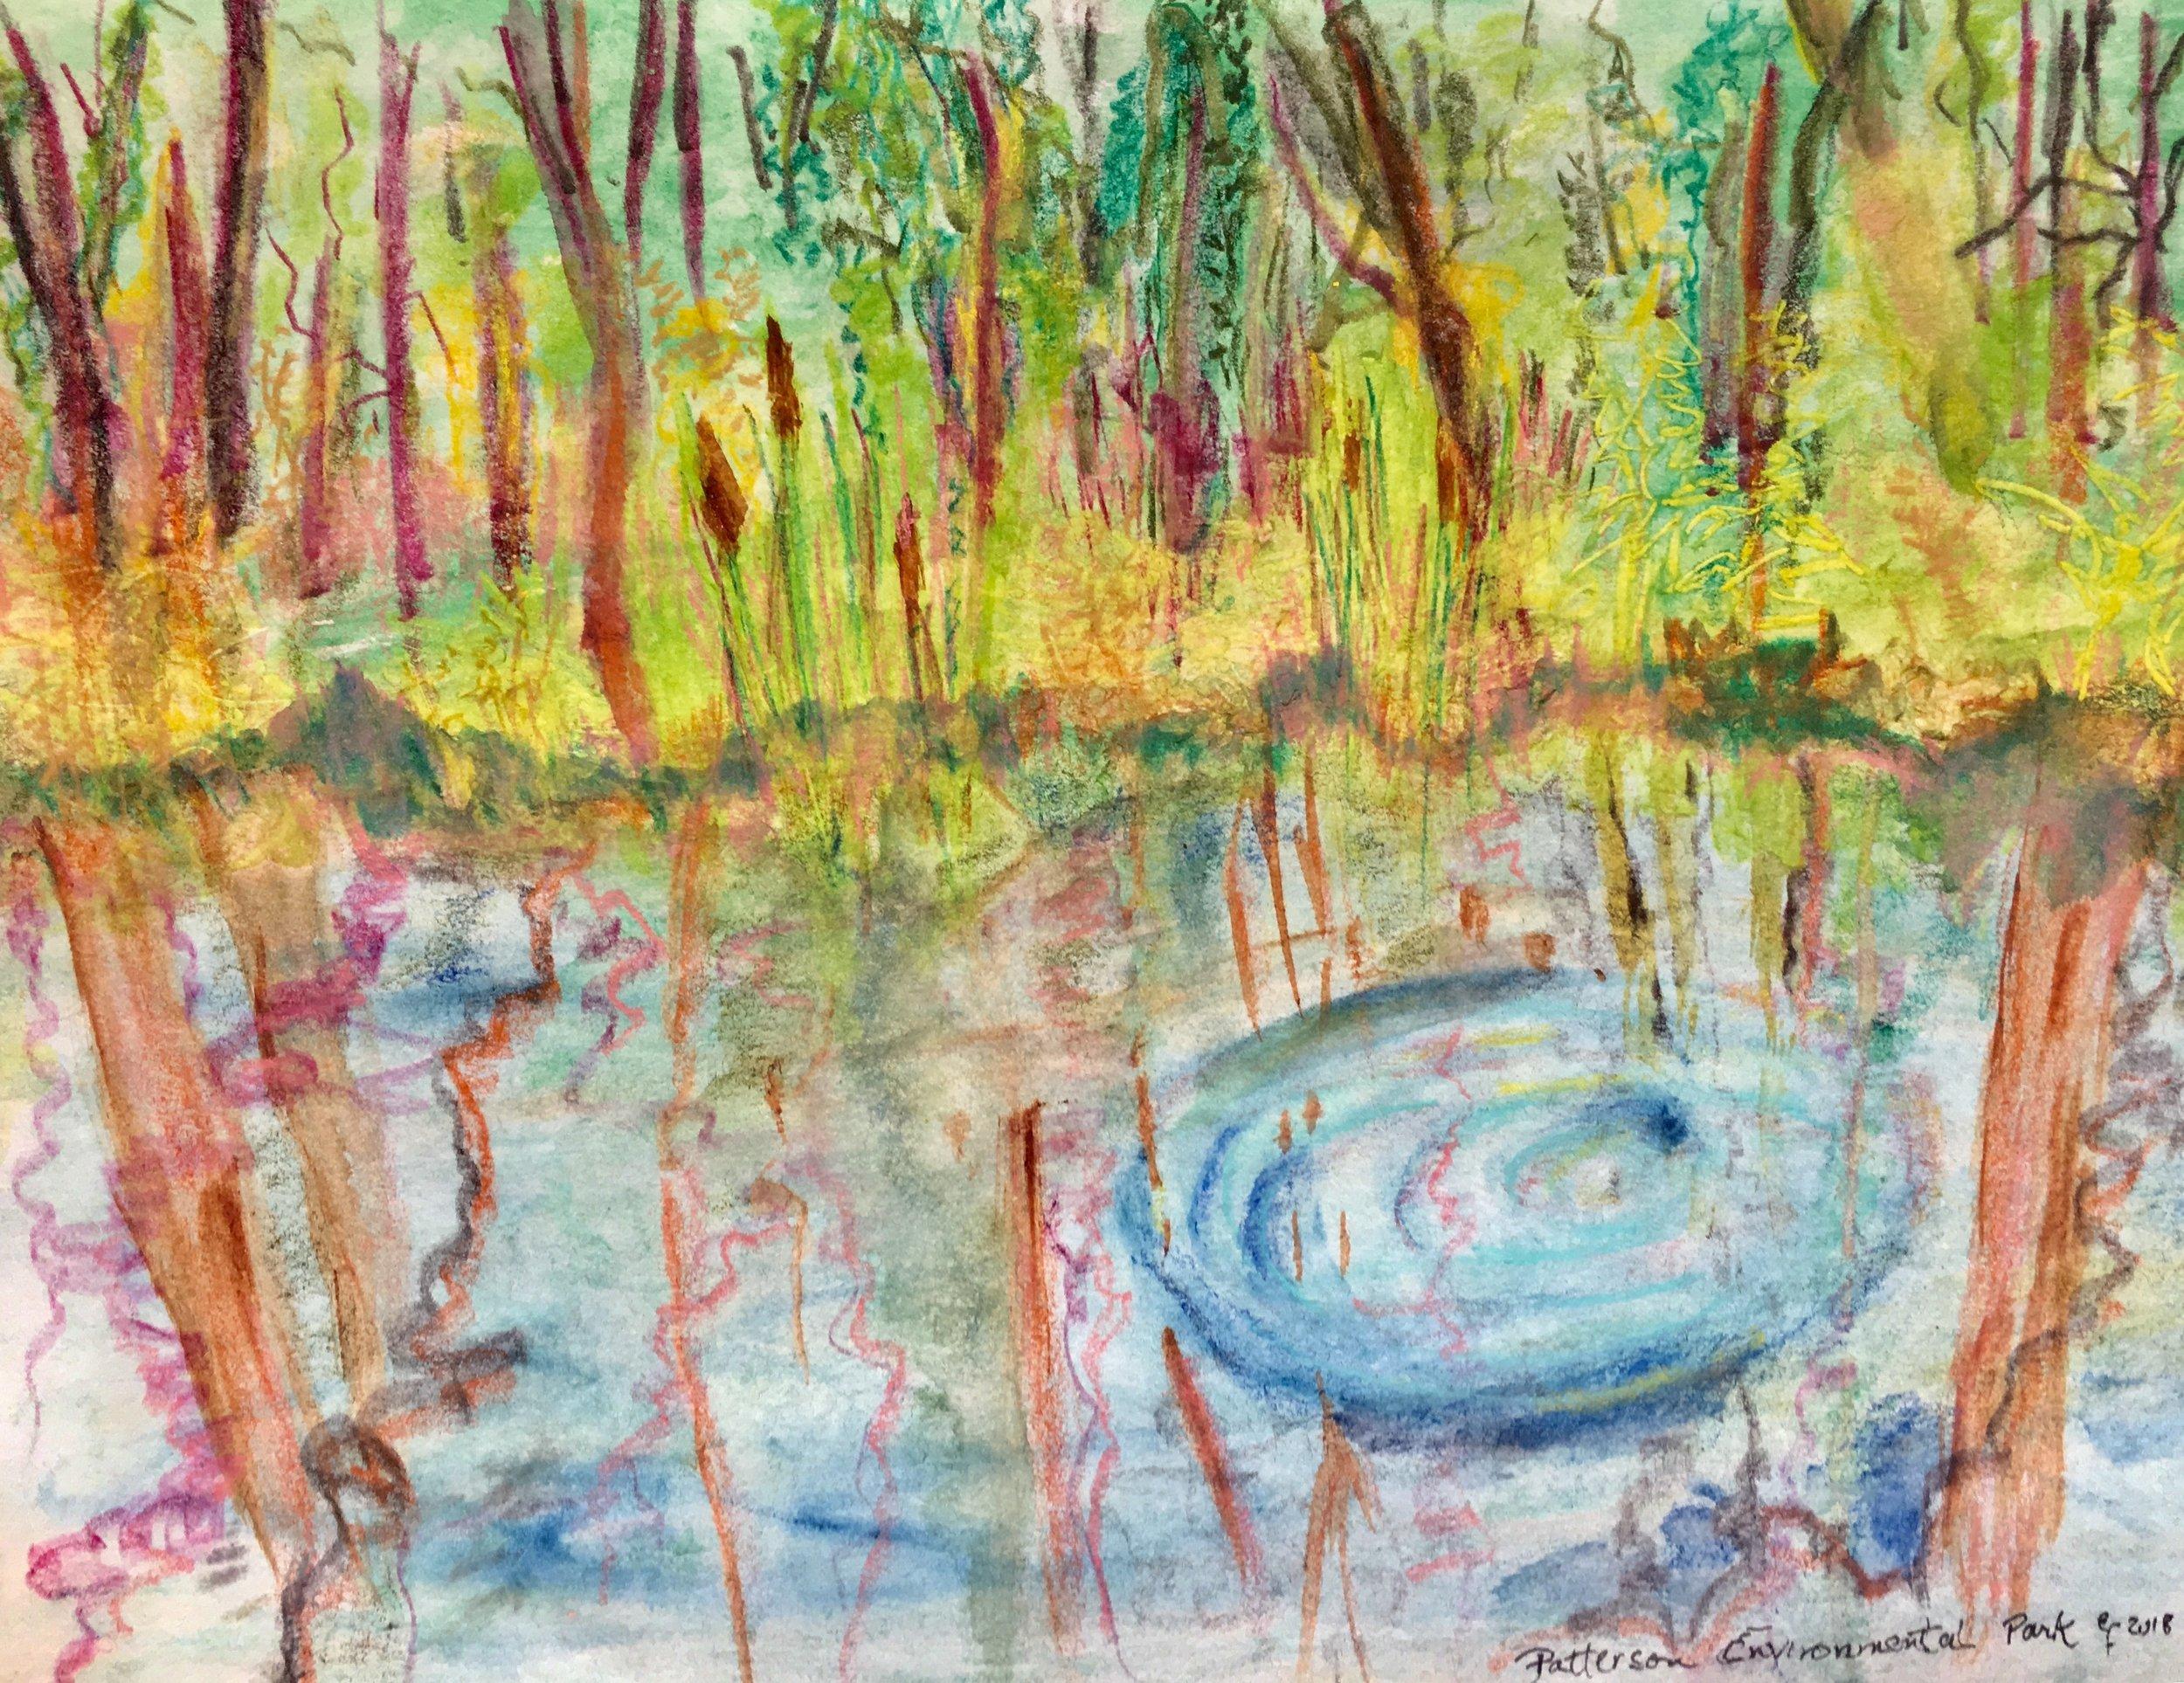 "Mixed Media watercolor done au plein air at Patterson Environmental Park, 9x12"" framed"